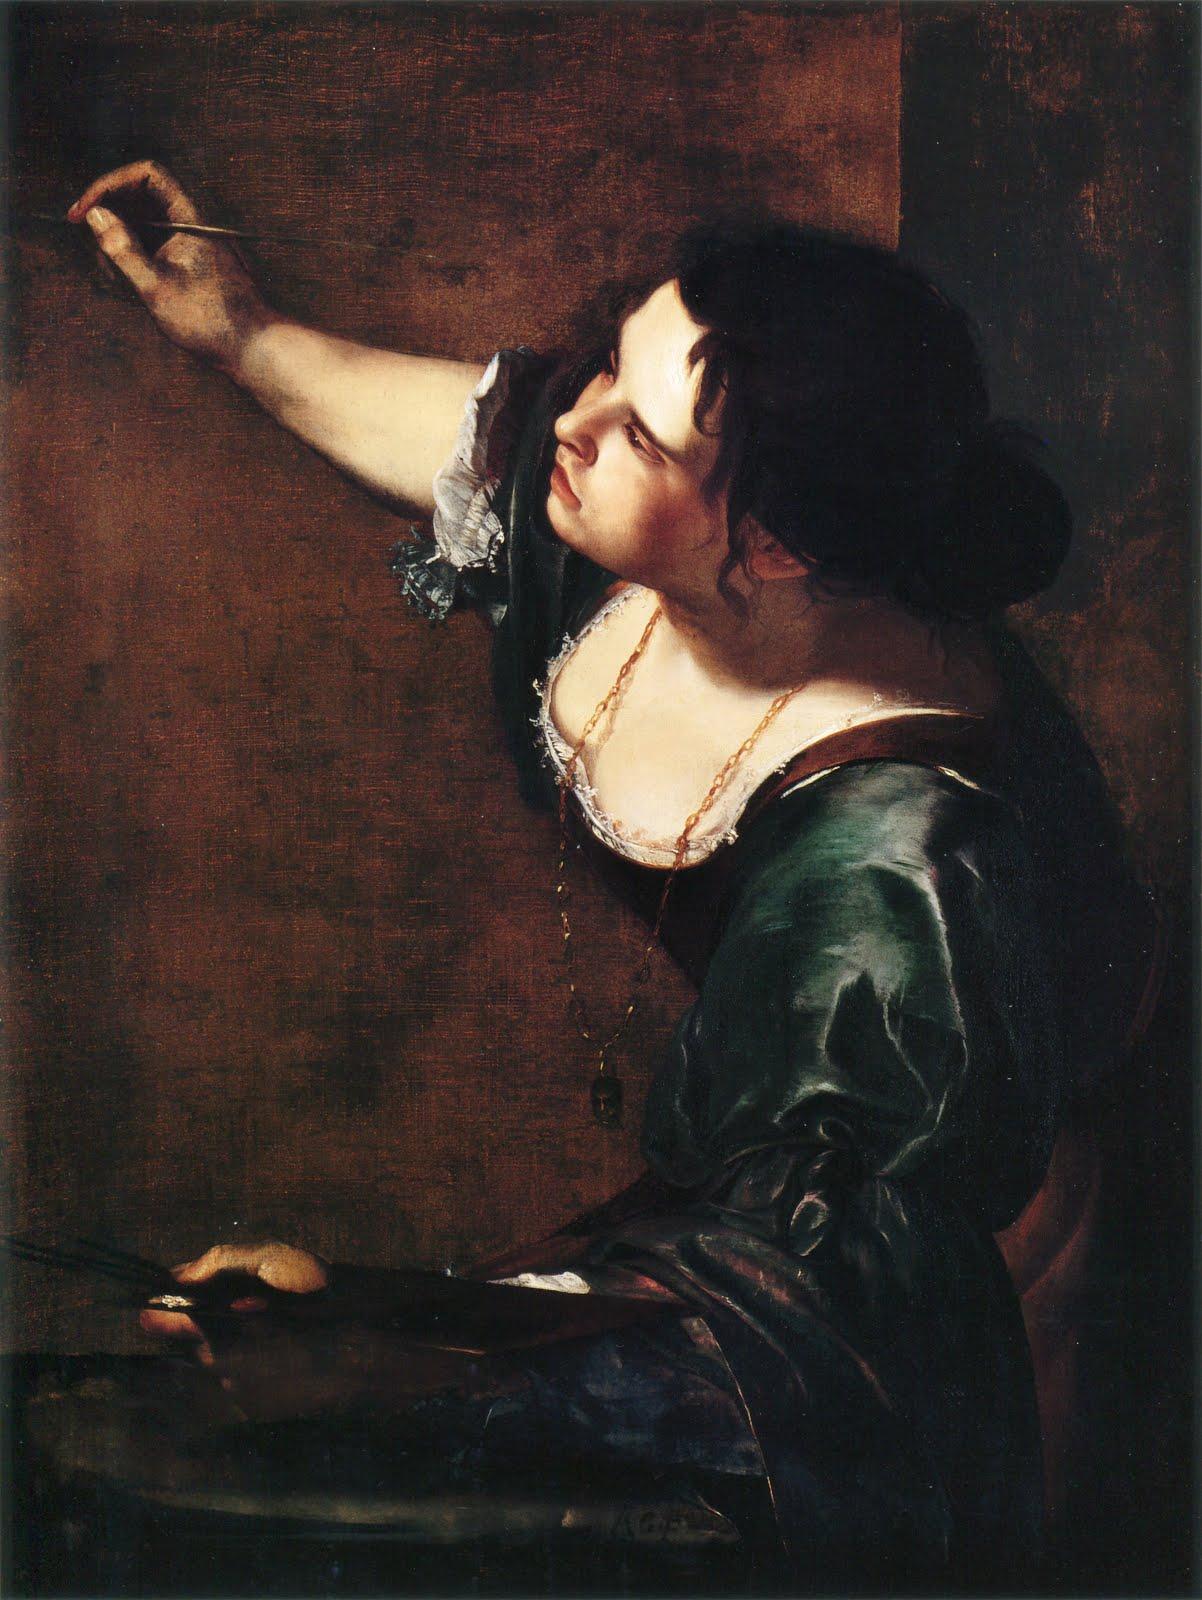 http://1.bp.blogspot.com/-CuXR2SVvaZ4/UIS6vAxiIsI/AAAAAAAAR_k/nHwrg3UwZtI/s1600/Gentileschi-Artemisia_Self-portrait_1638.jpg